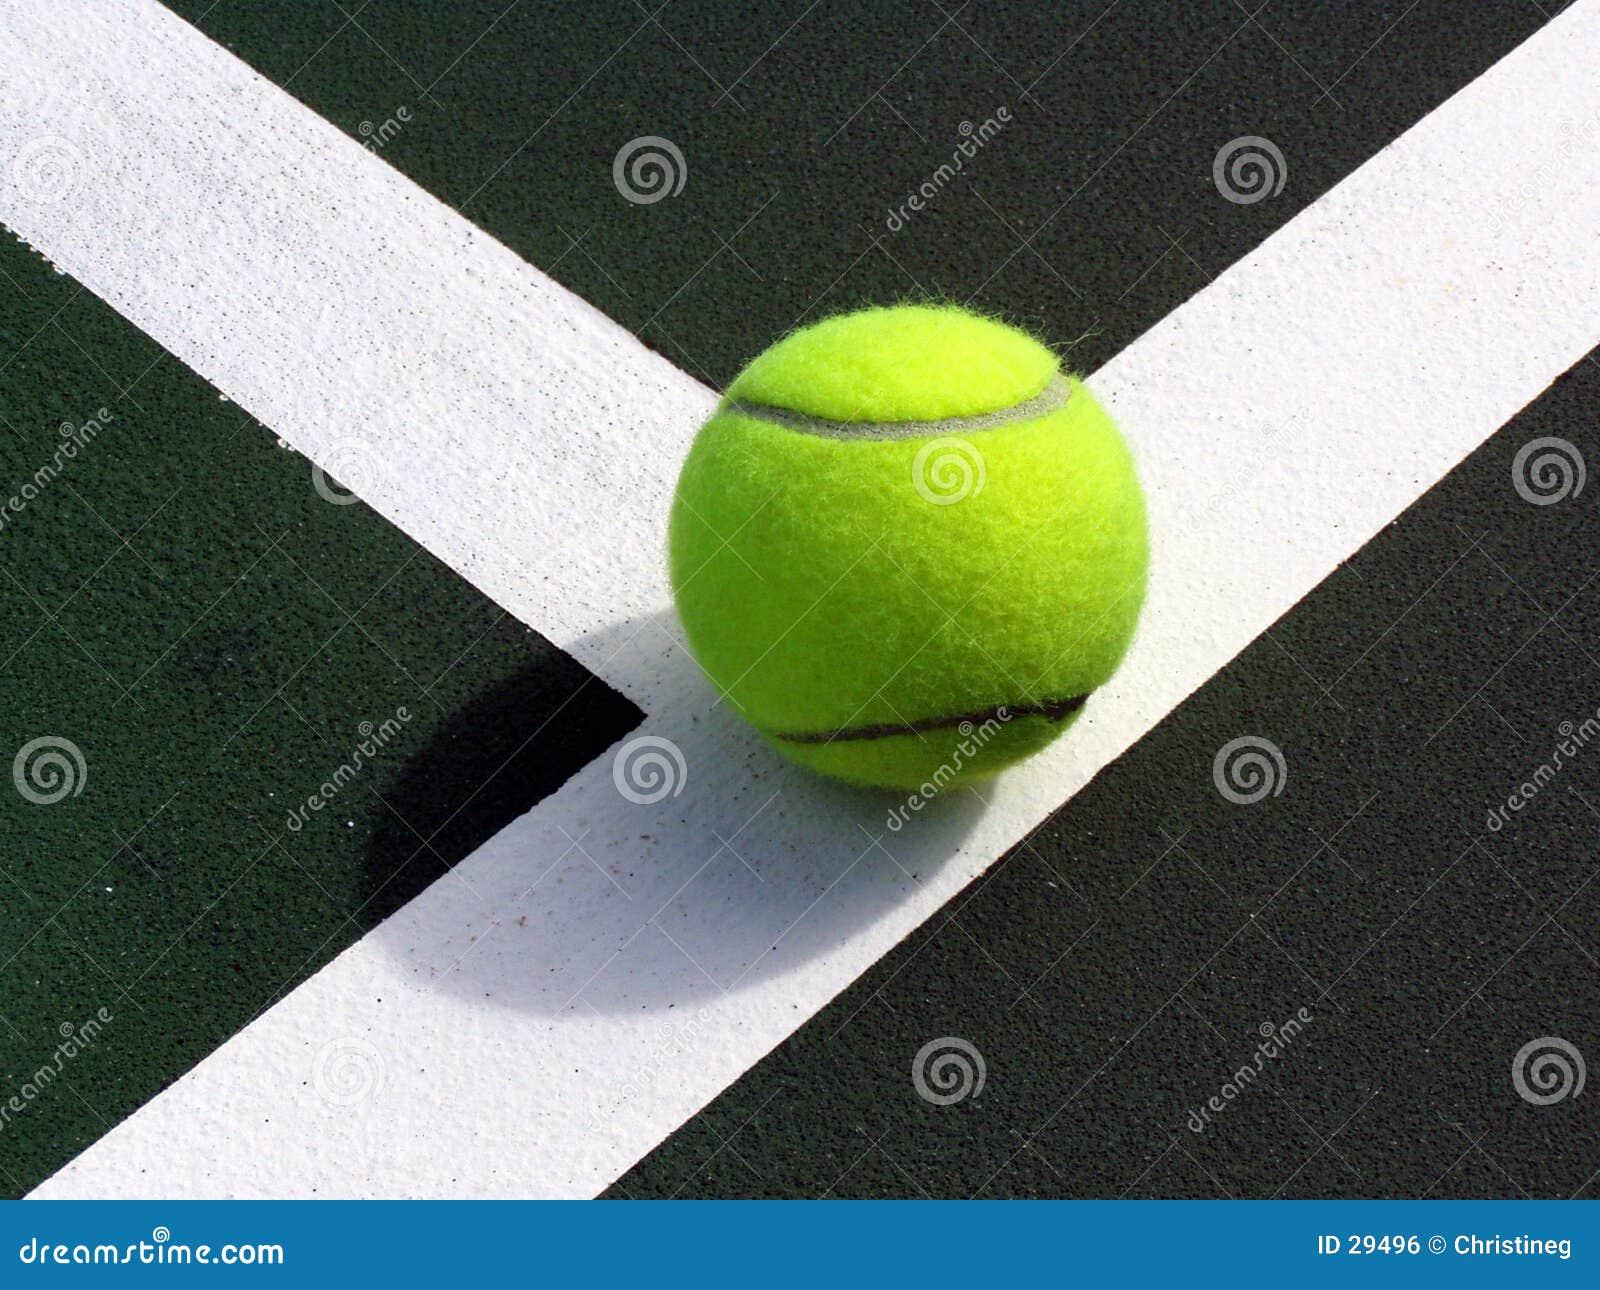 Tennist Ball on the Line